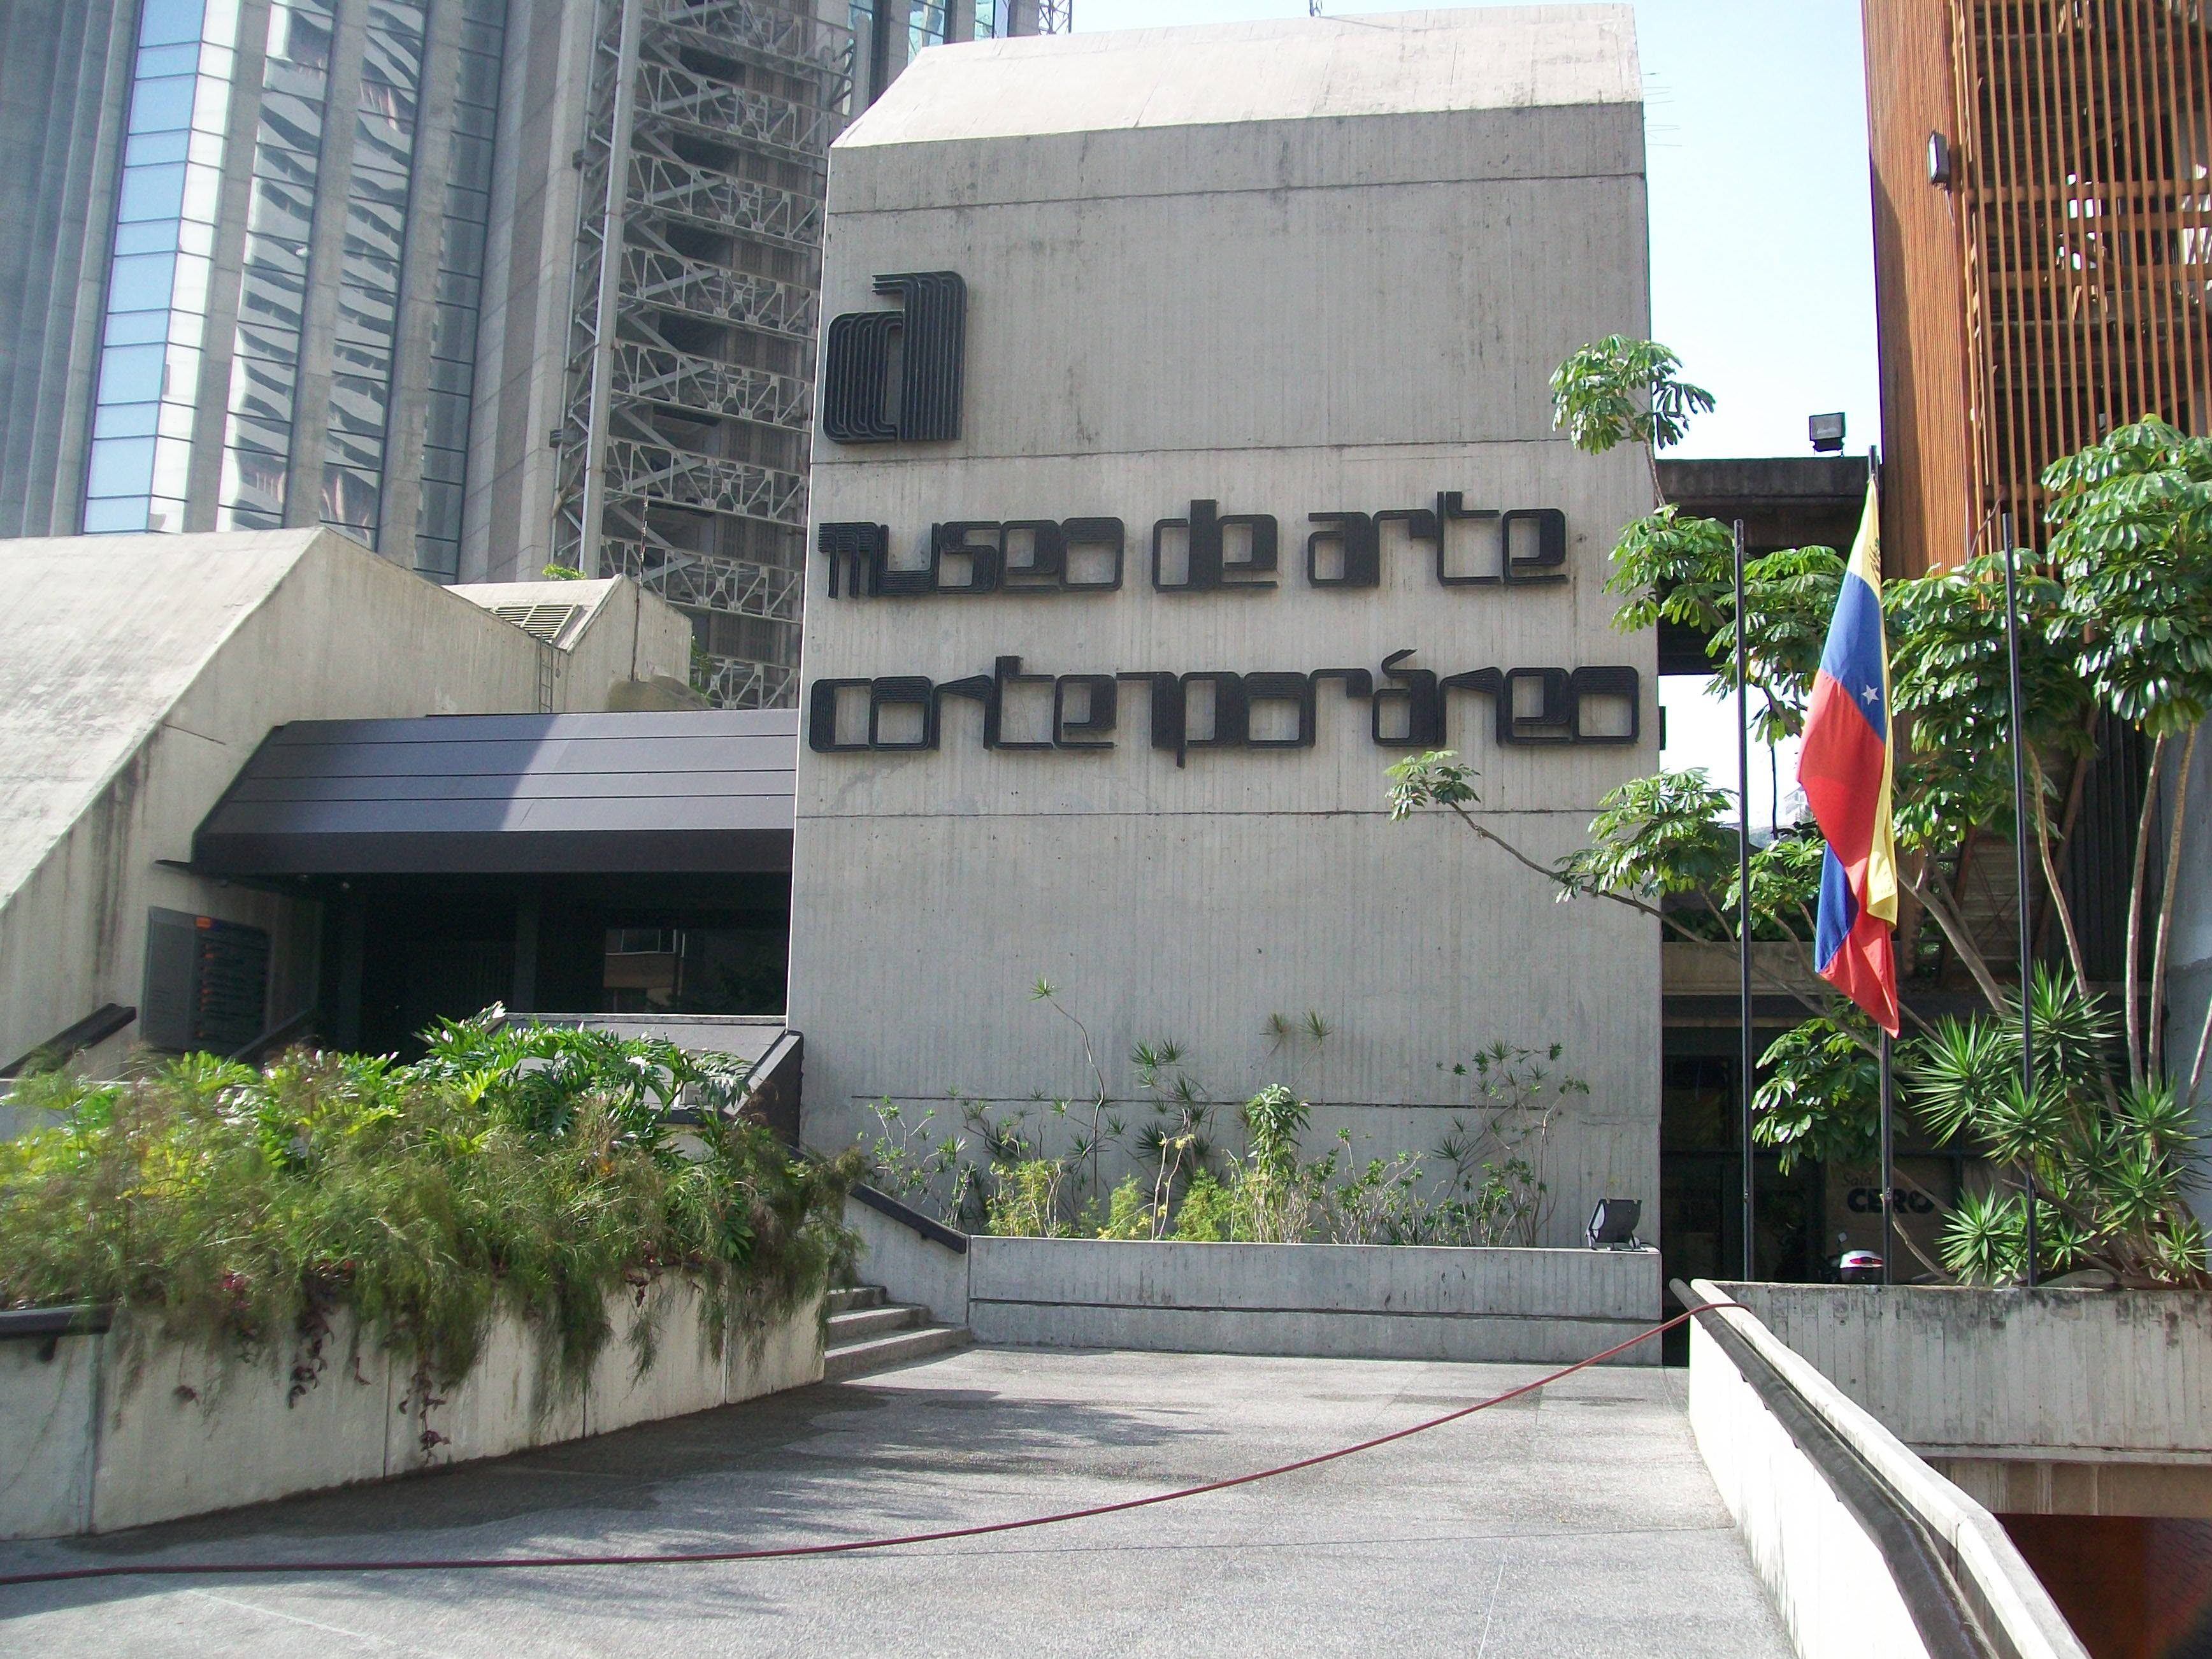 File:Museo arte contemp Caracas.JPG - Wikimedia Commons